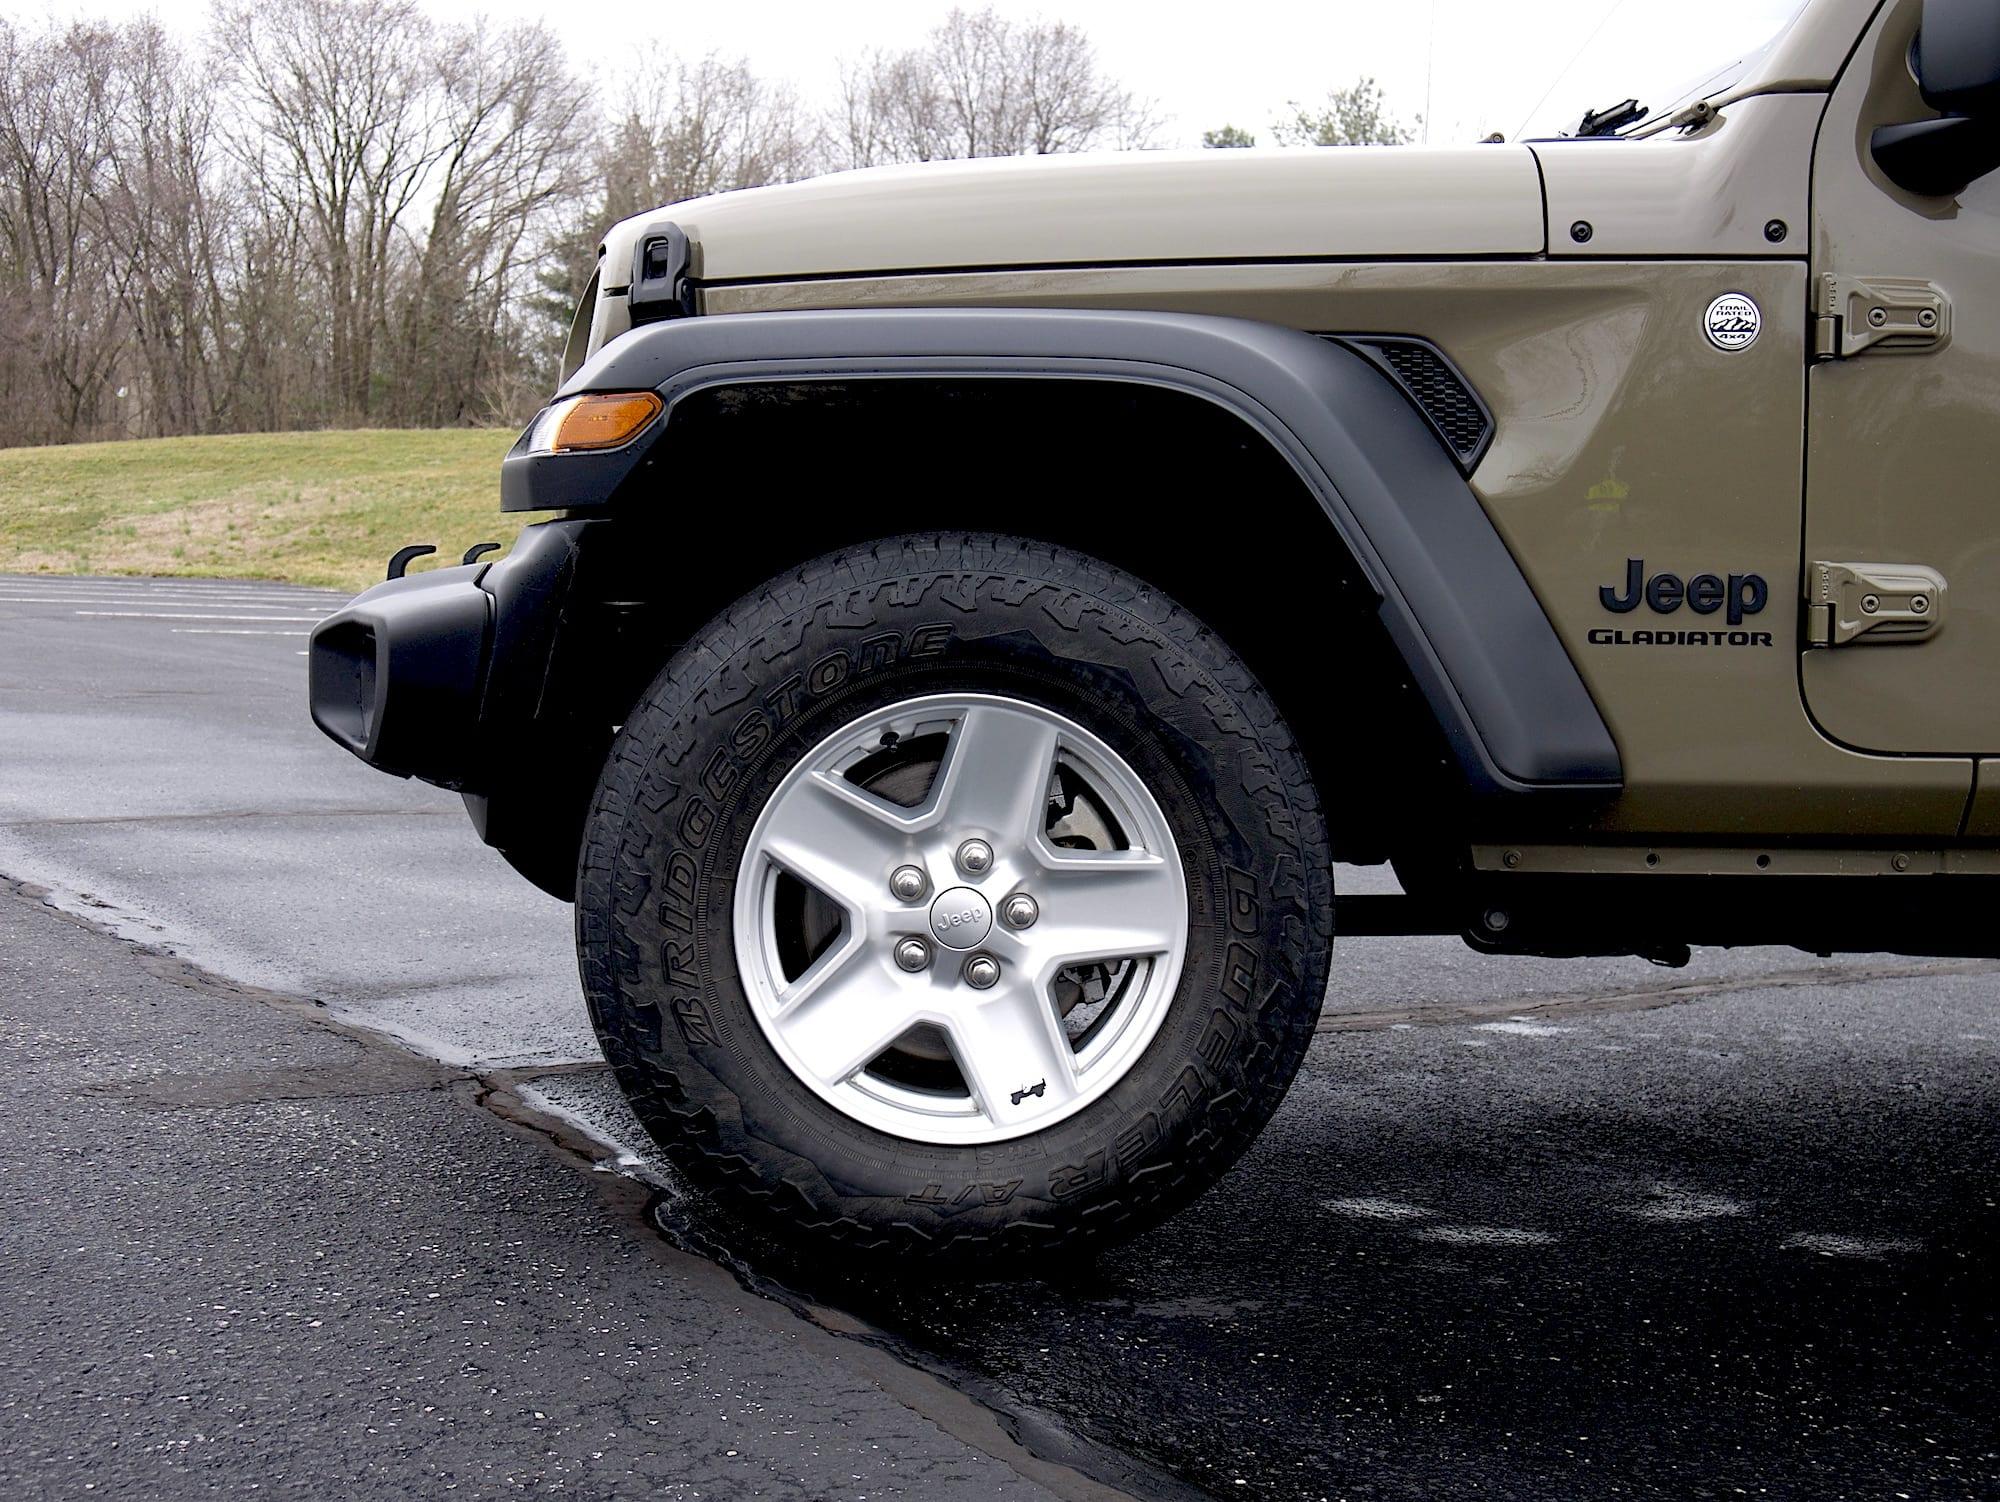 2020 Jeep Gladiator front fender